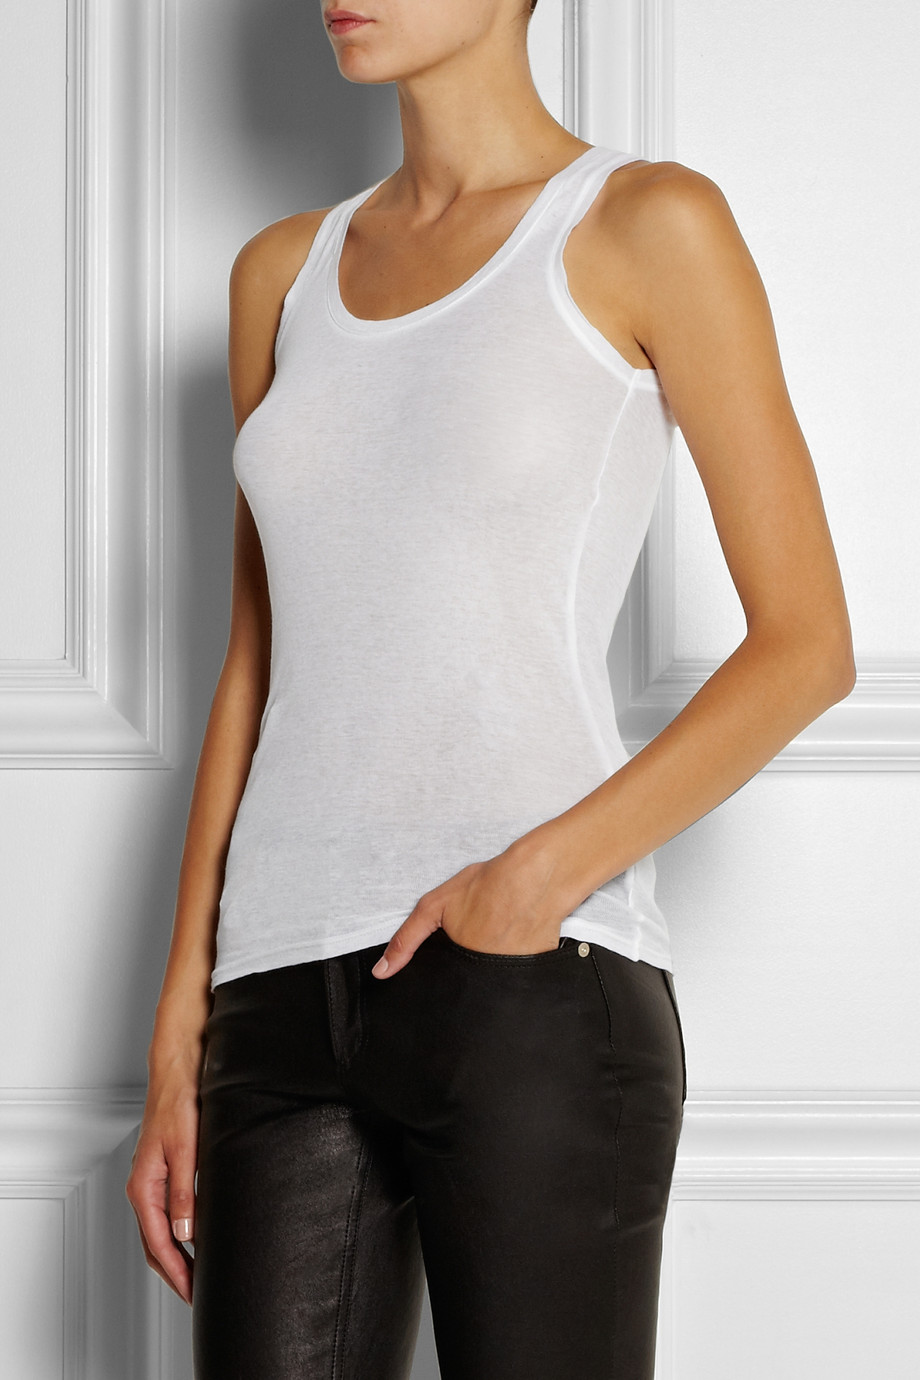 american vintage massachusetts sleeved top in white